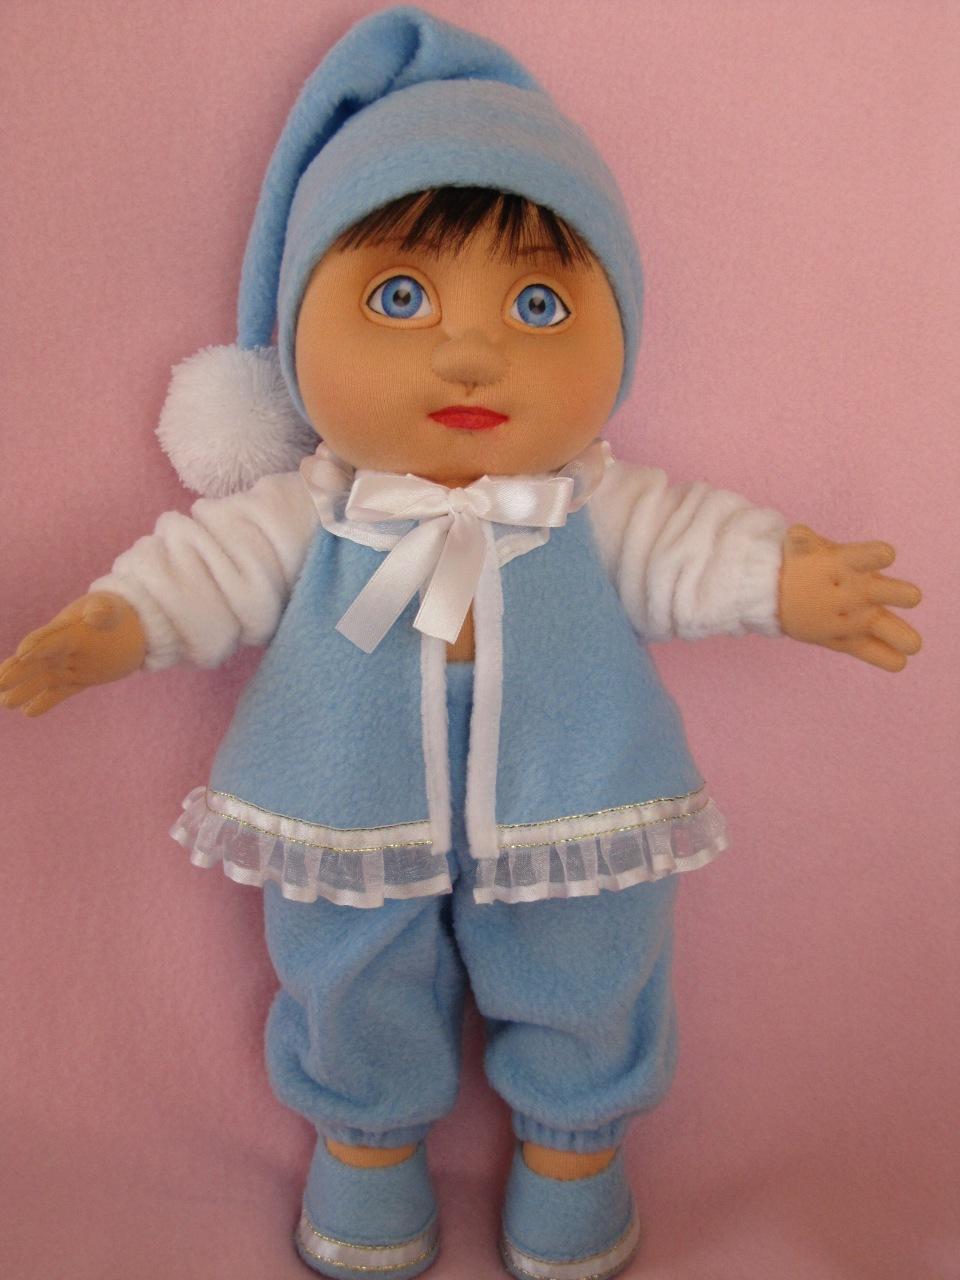 Кукла малыш своими руками из ткани